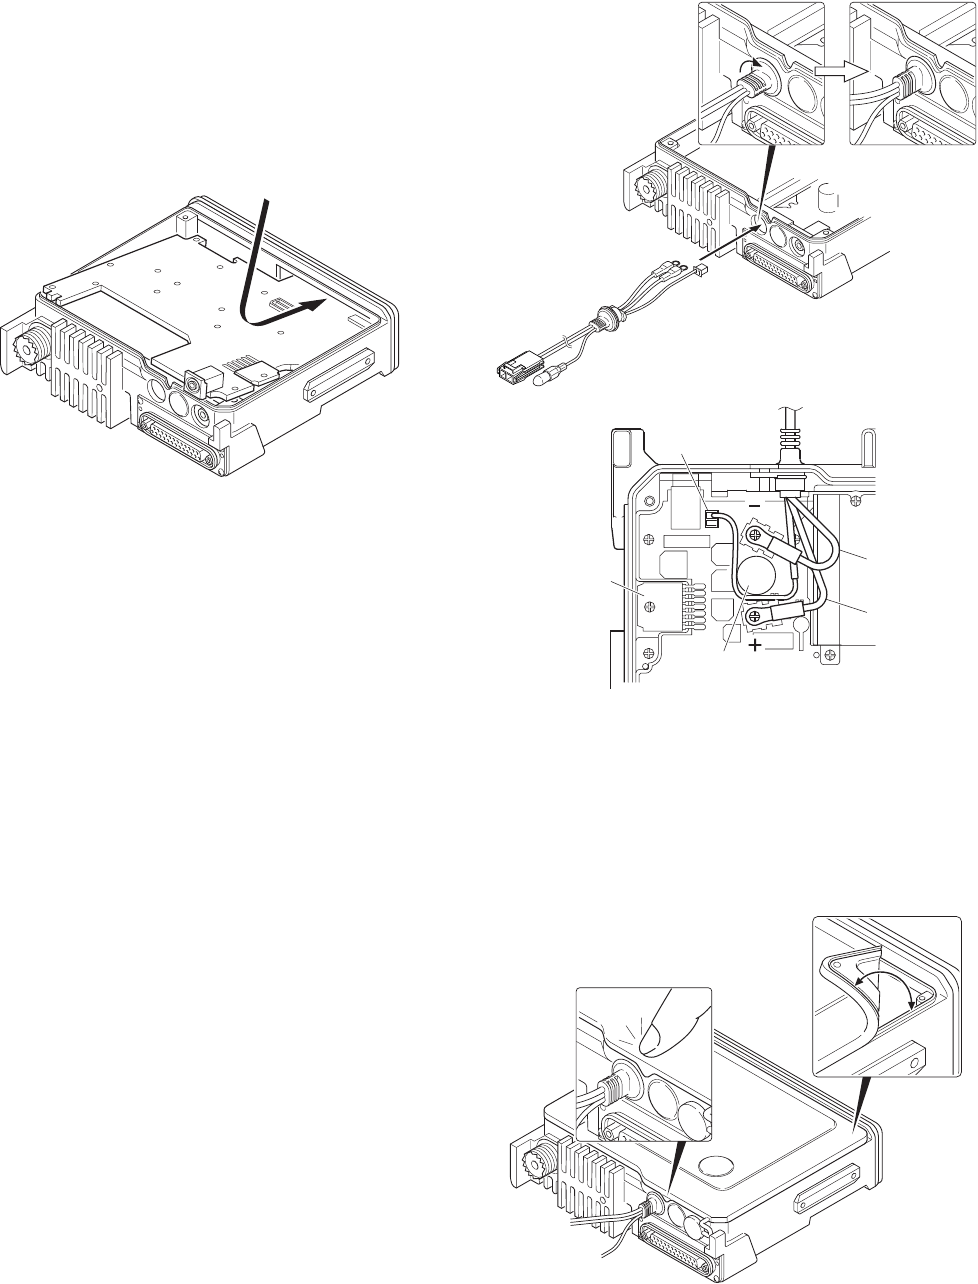 Kenwood TK-7180 2. Precautions on Reassembly